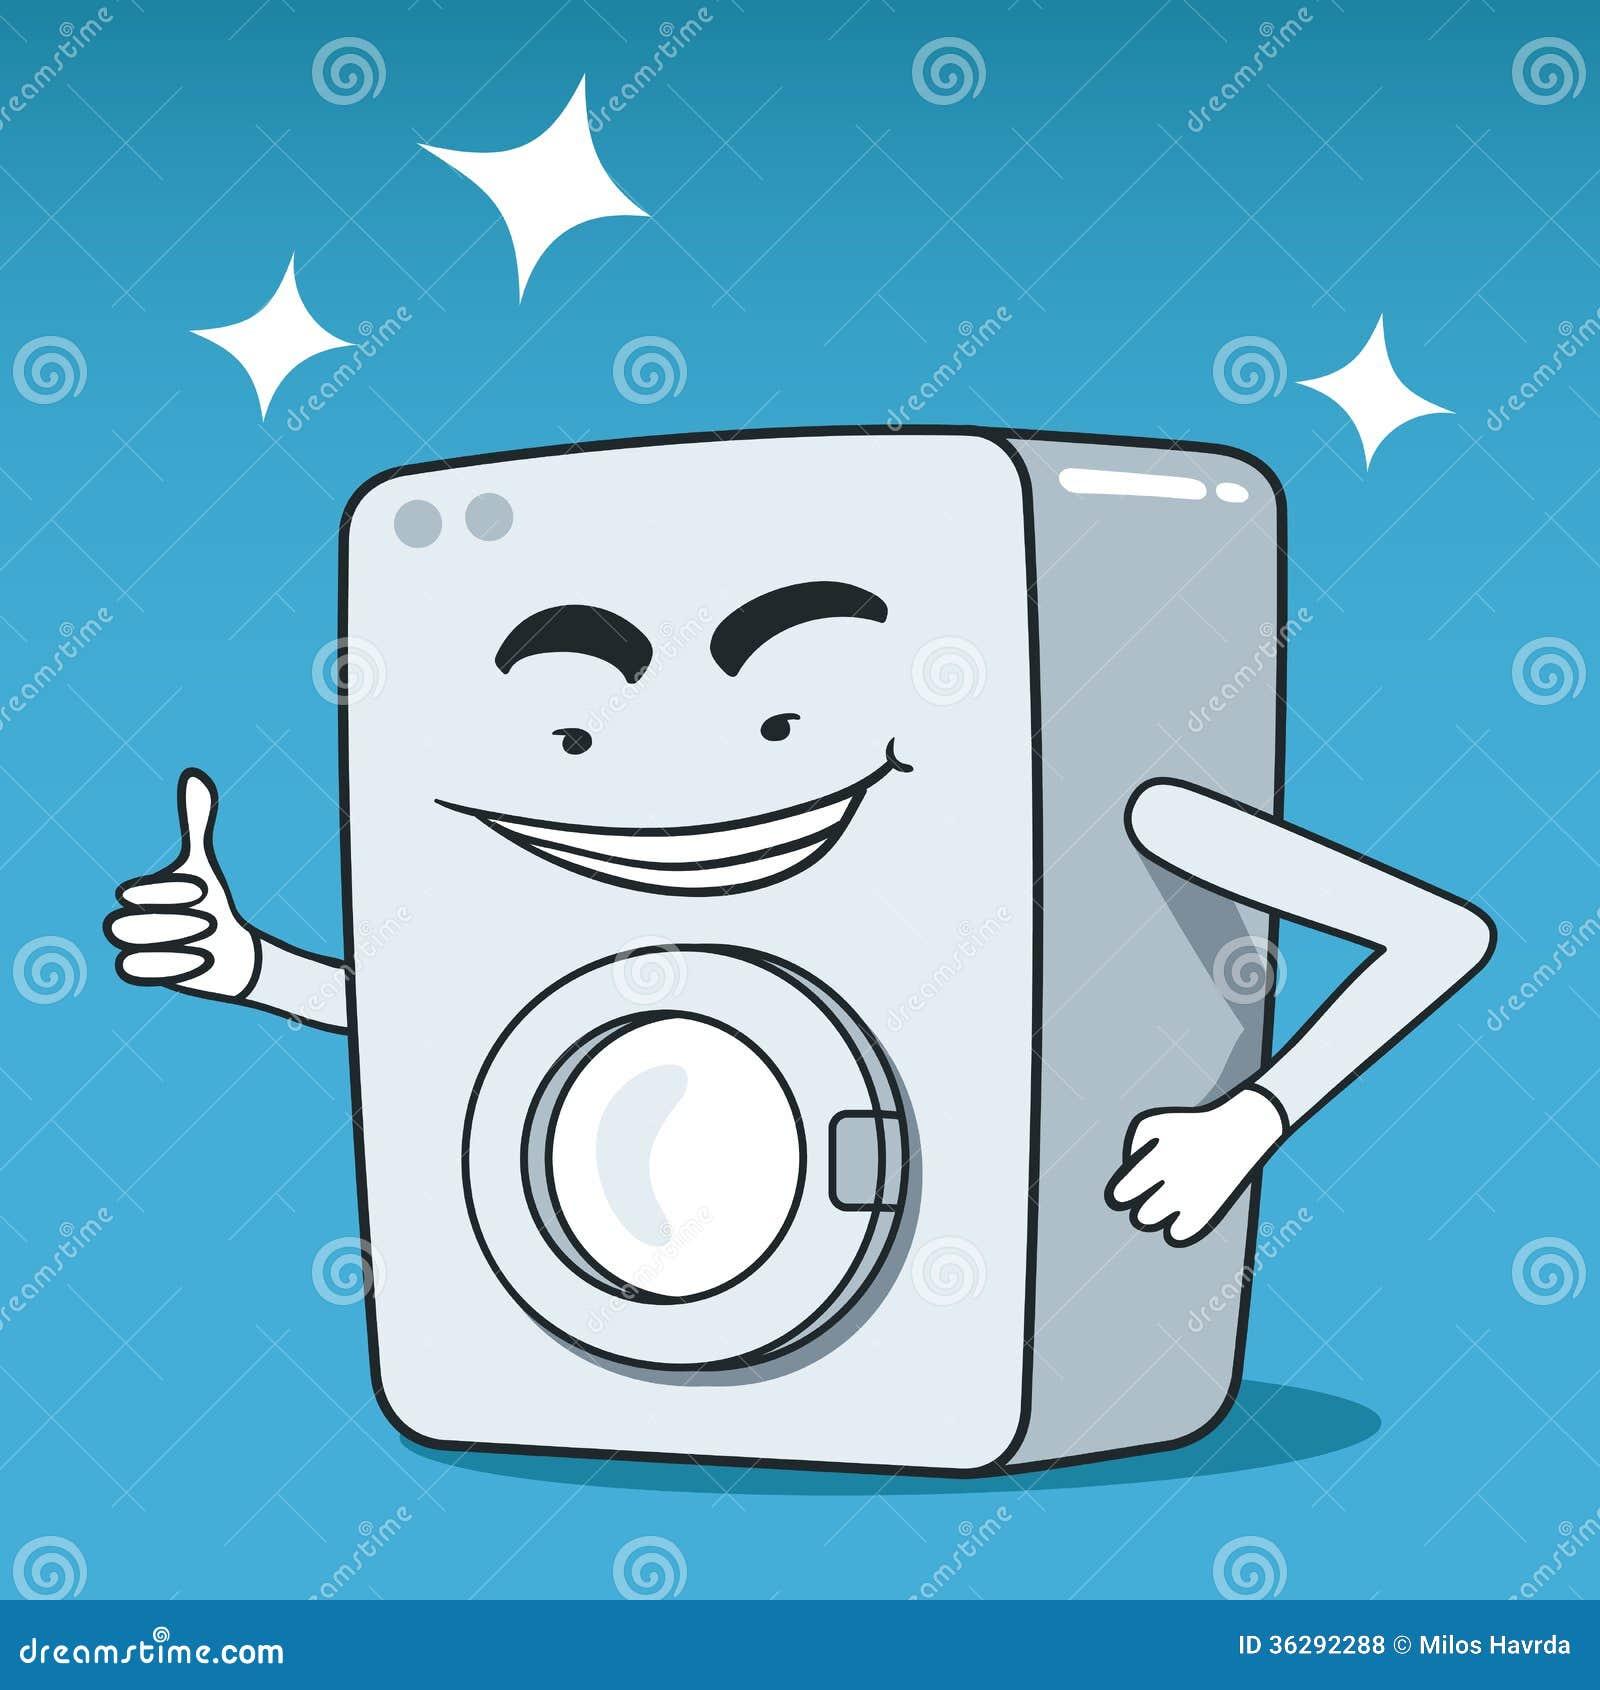 Cartoon Washing Machine ~ Washing machine illustrated character stock vector image